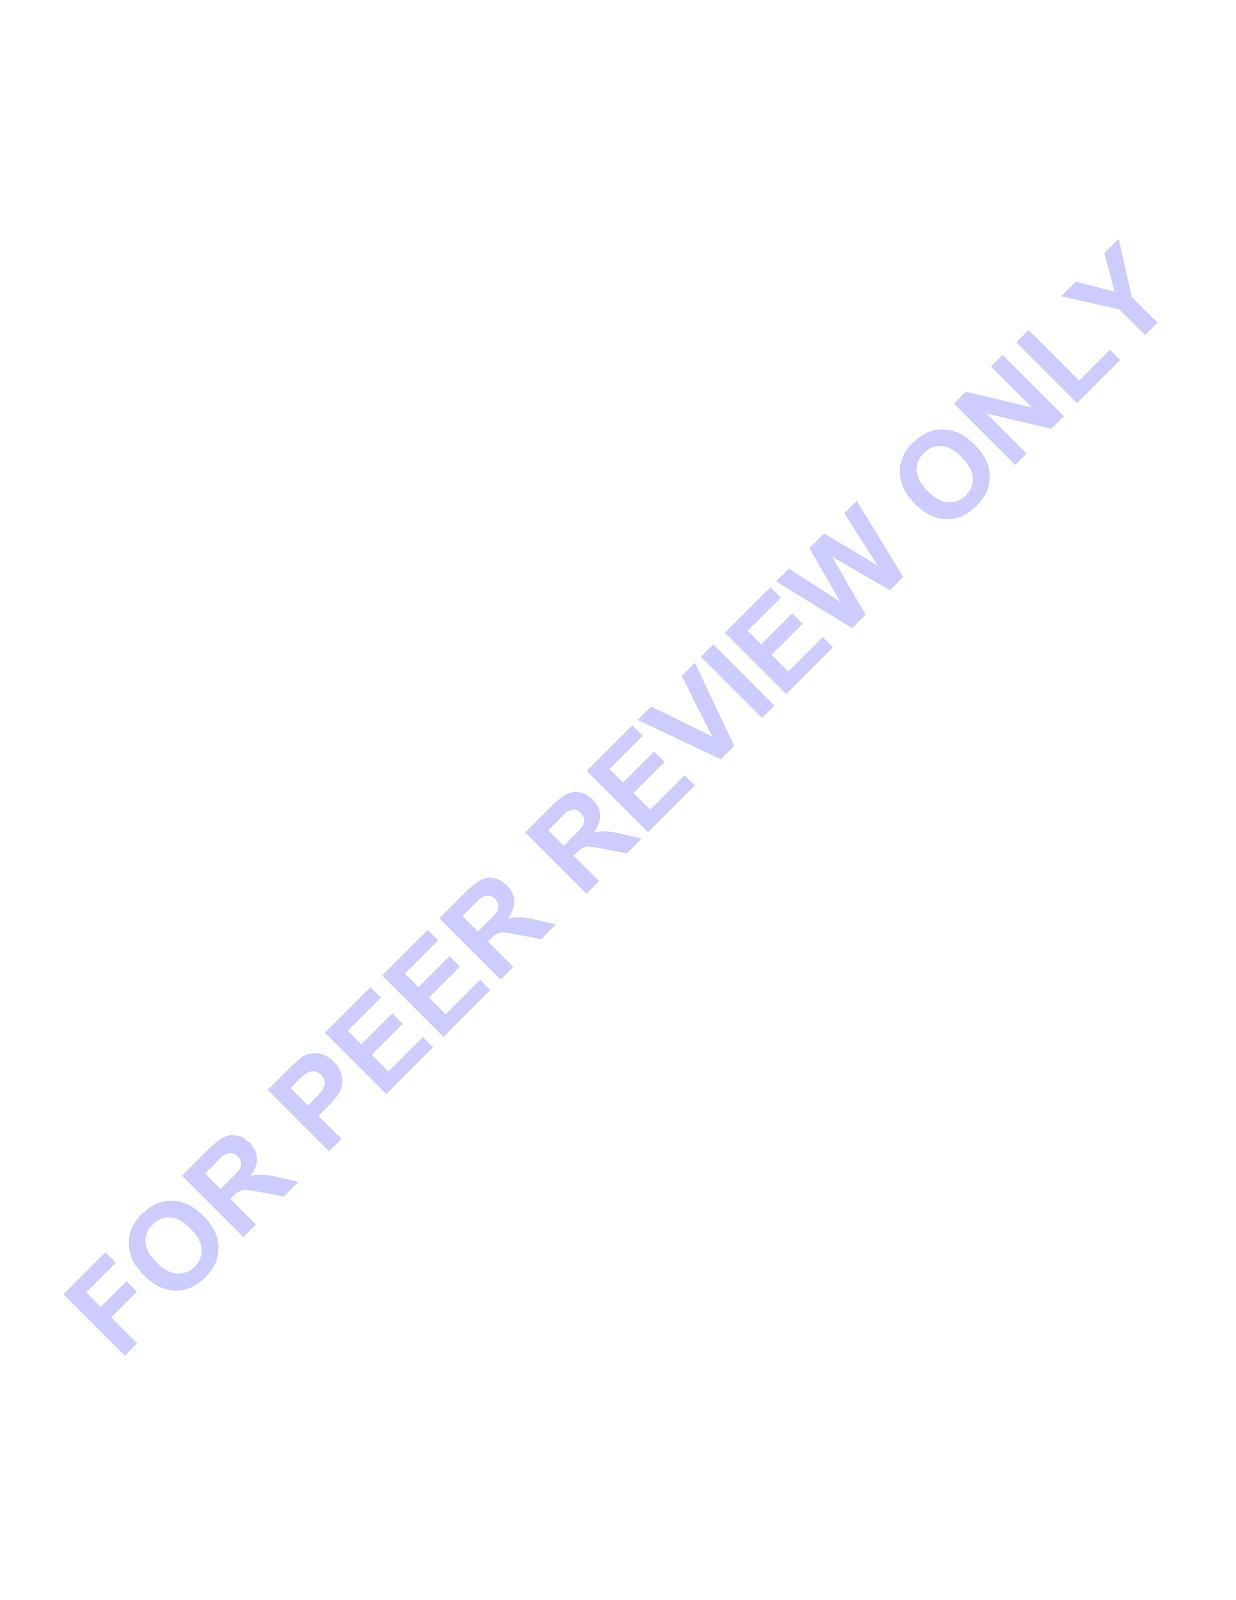 Asymptotically Unbiased: R: Create Watermark for SAS ODS Reports: asymptoticallyunbiased.blogspot.com/2013/03/sas-reproducible...